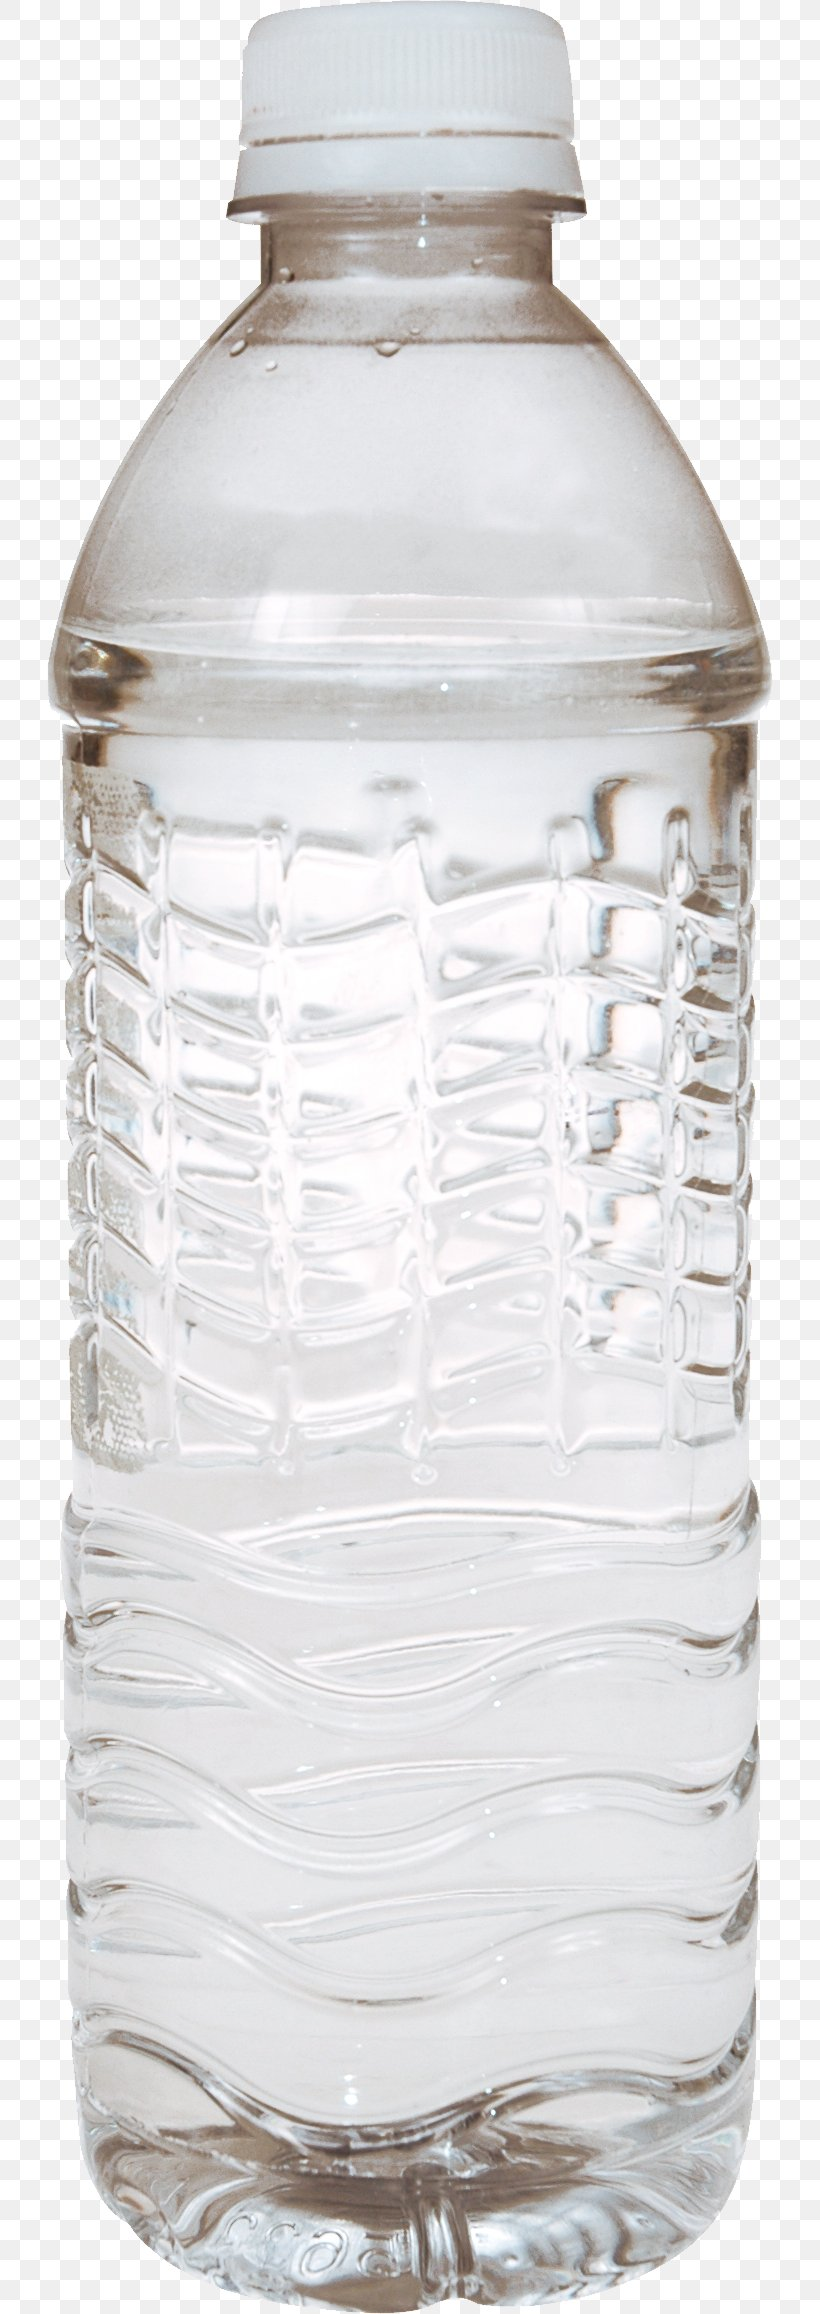 Water Bottle Plastic Bottle, PNG, 726x2314px, Alice S Adventures In Wonderland, Alice In Wonderland, Baby Shower, Bottle, Bottled Water Download Free